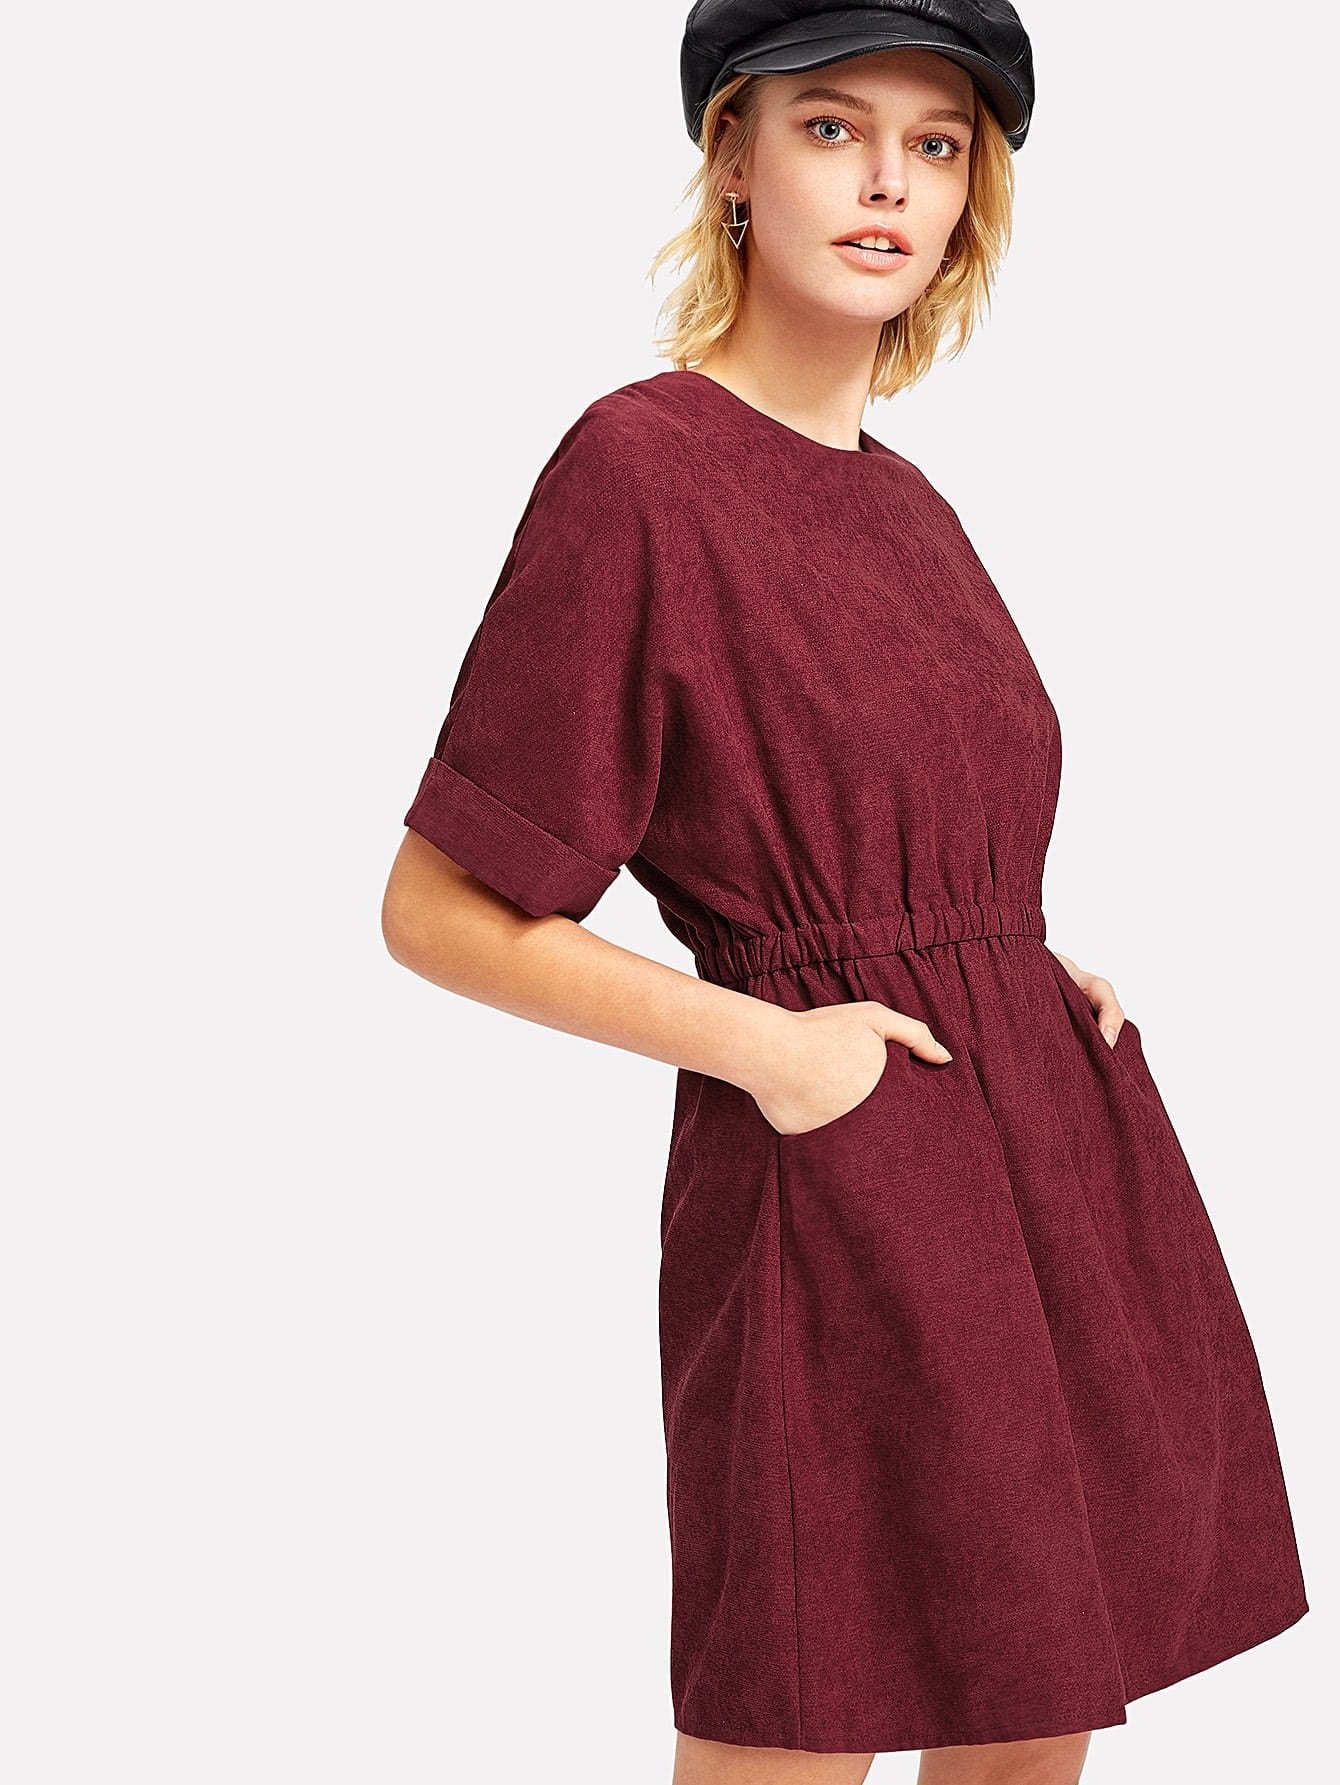 Dolman Sleeve Corduroy Dress corduroy babydoll smock dress